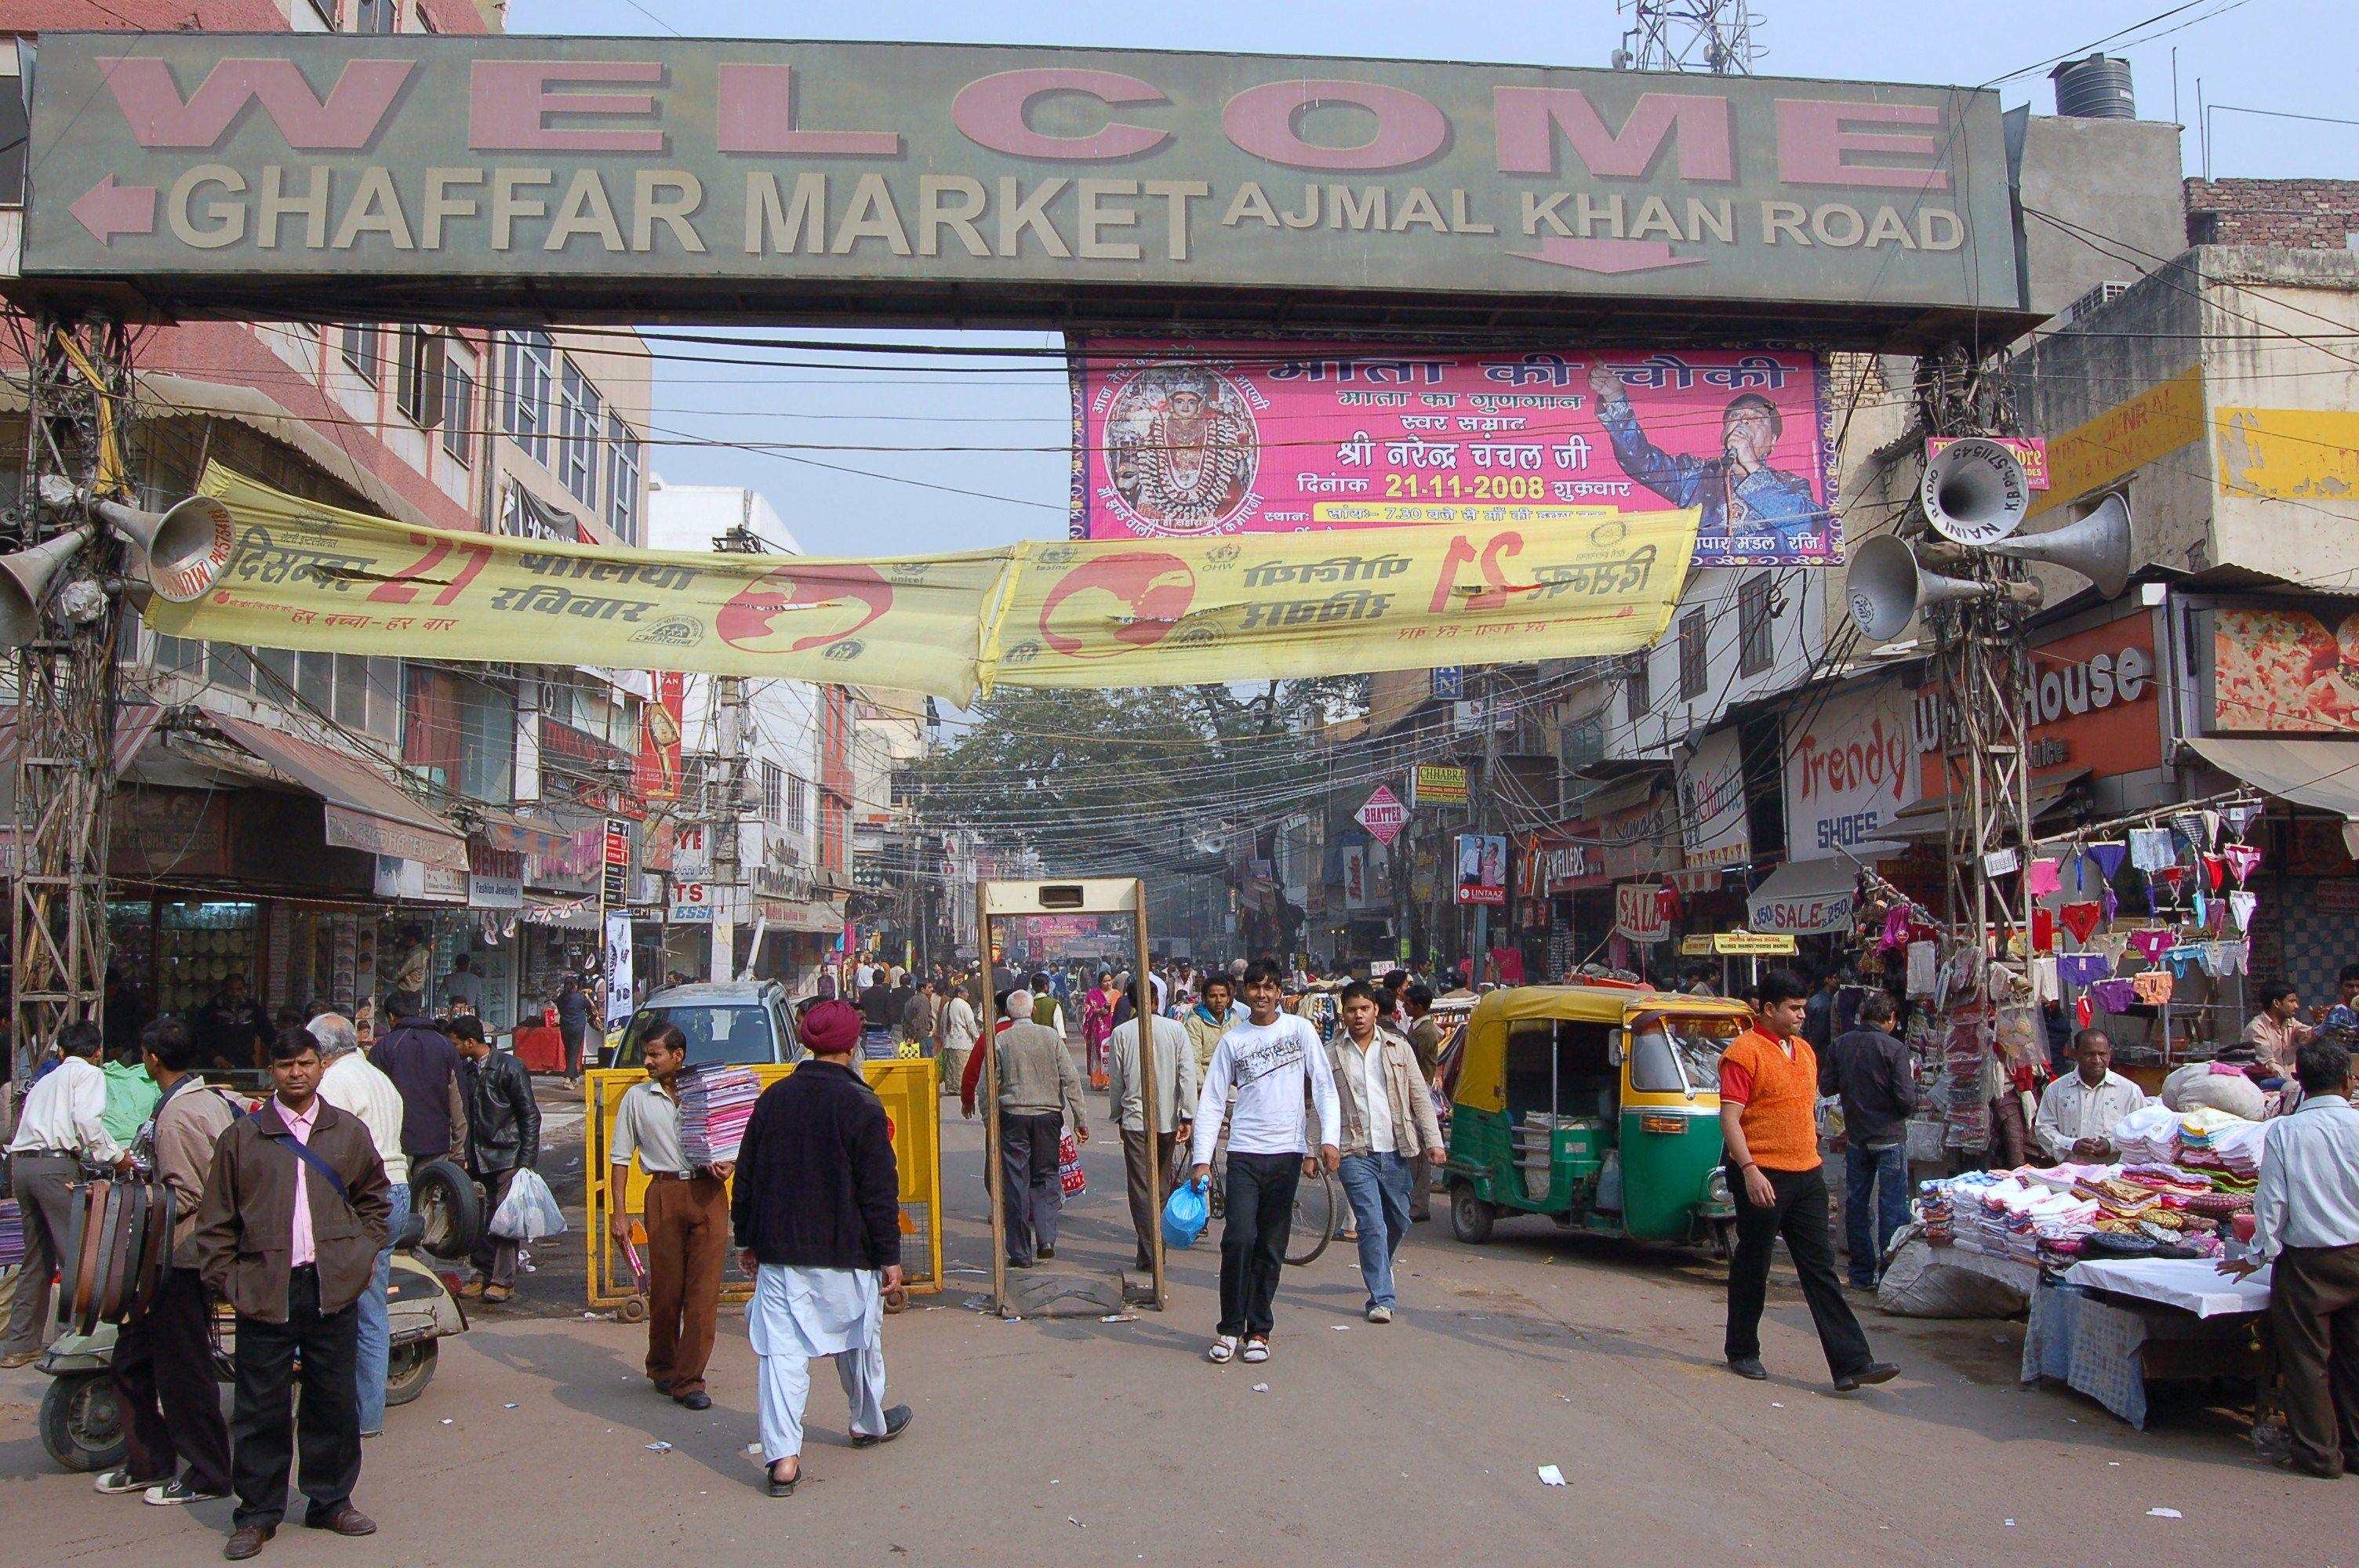 Entrada al mercado de Ghaffar